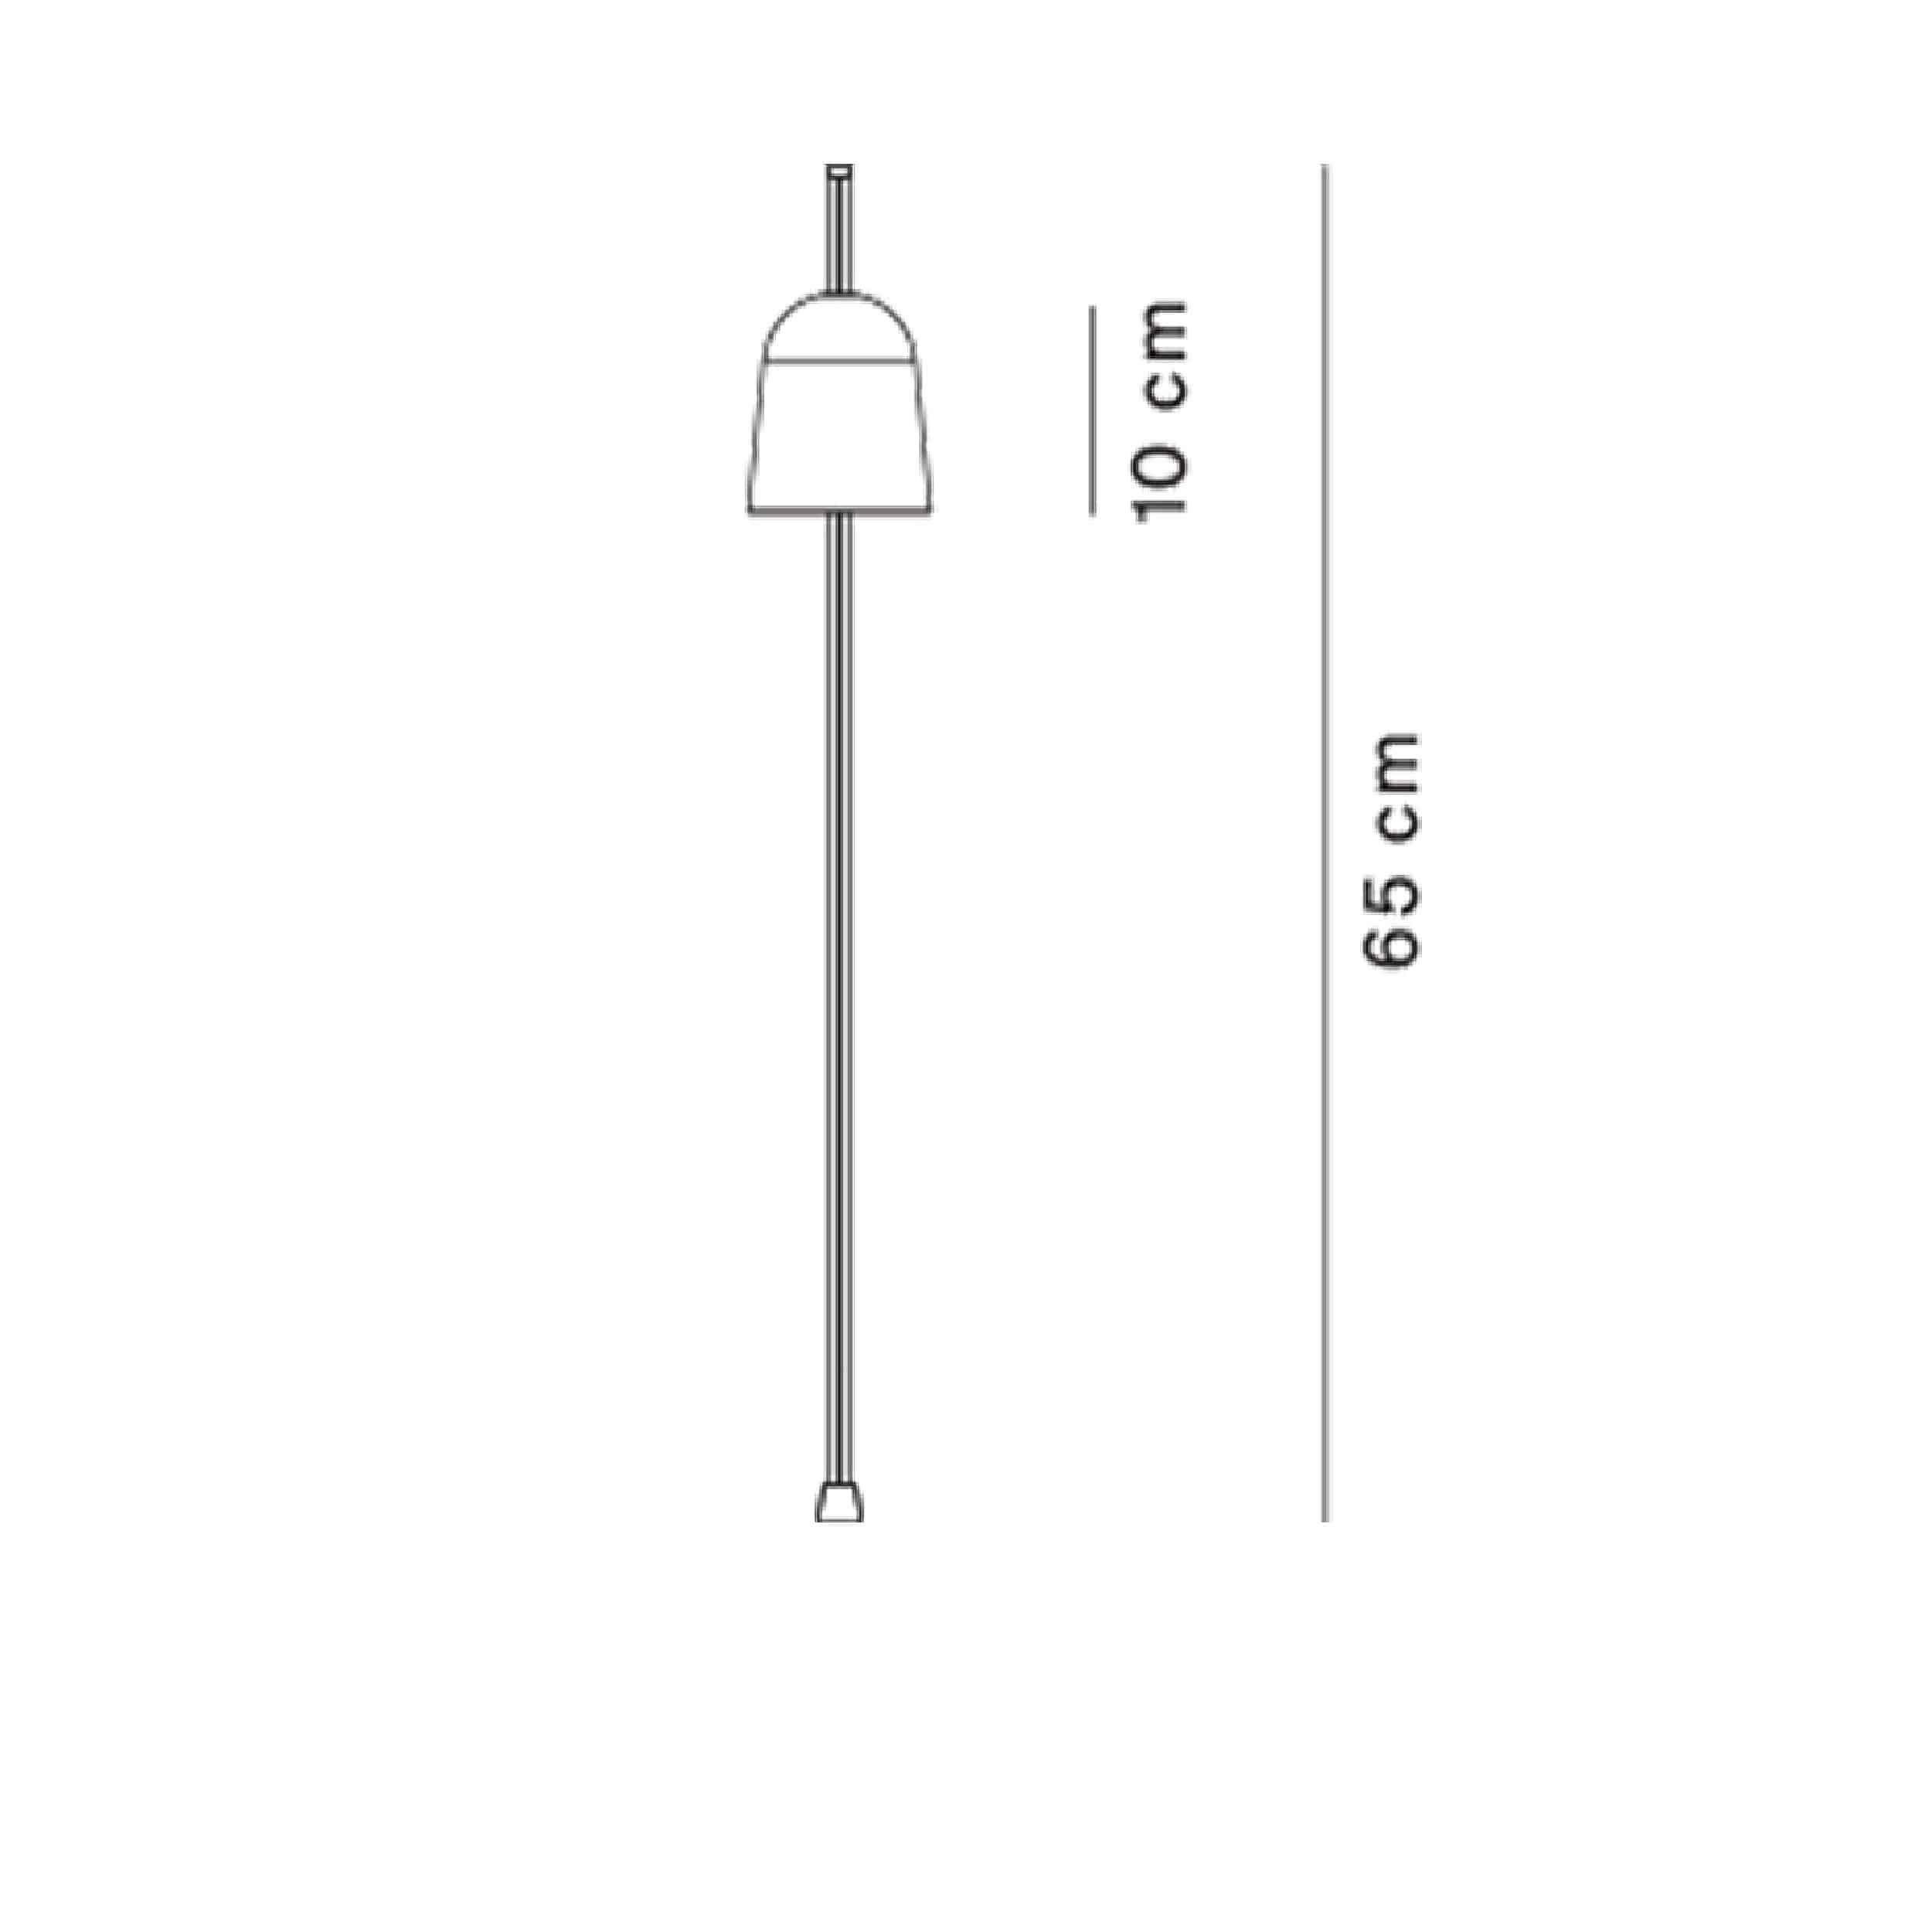 Ascent LED Klemmleuchte